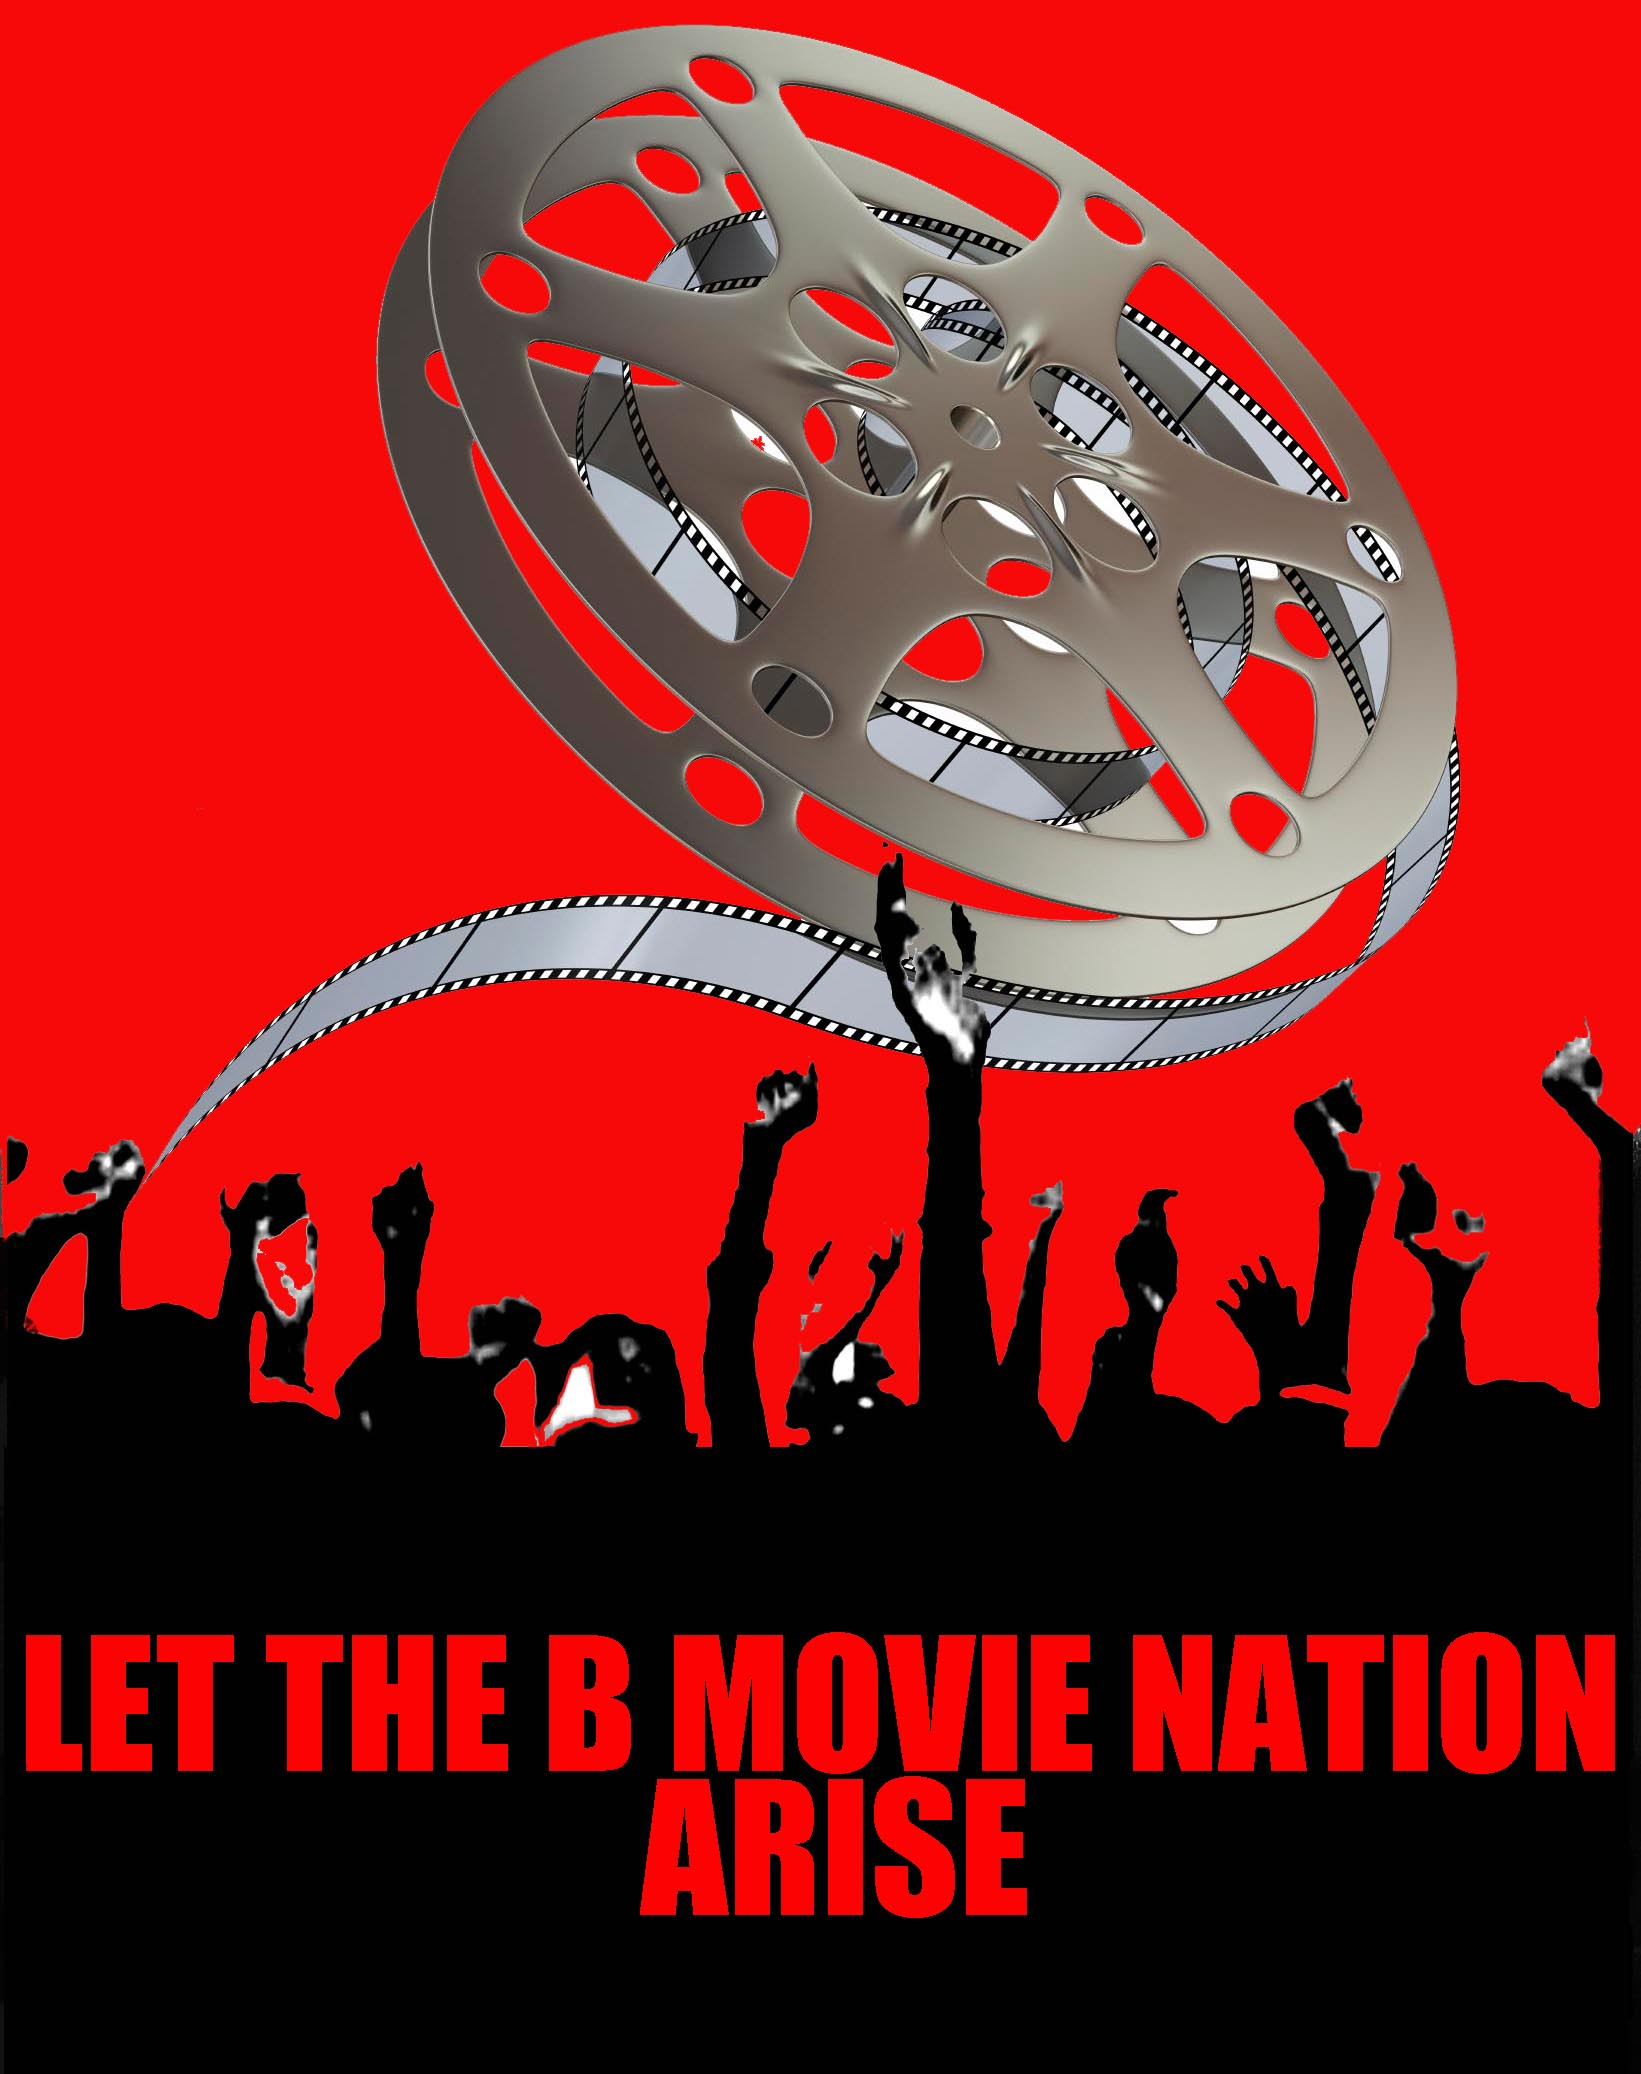 b-movie-nation-arise